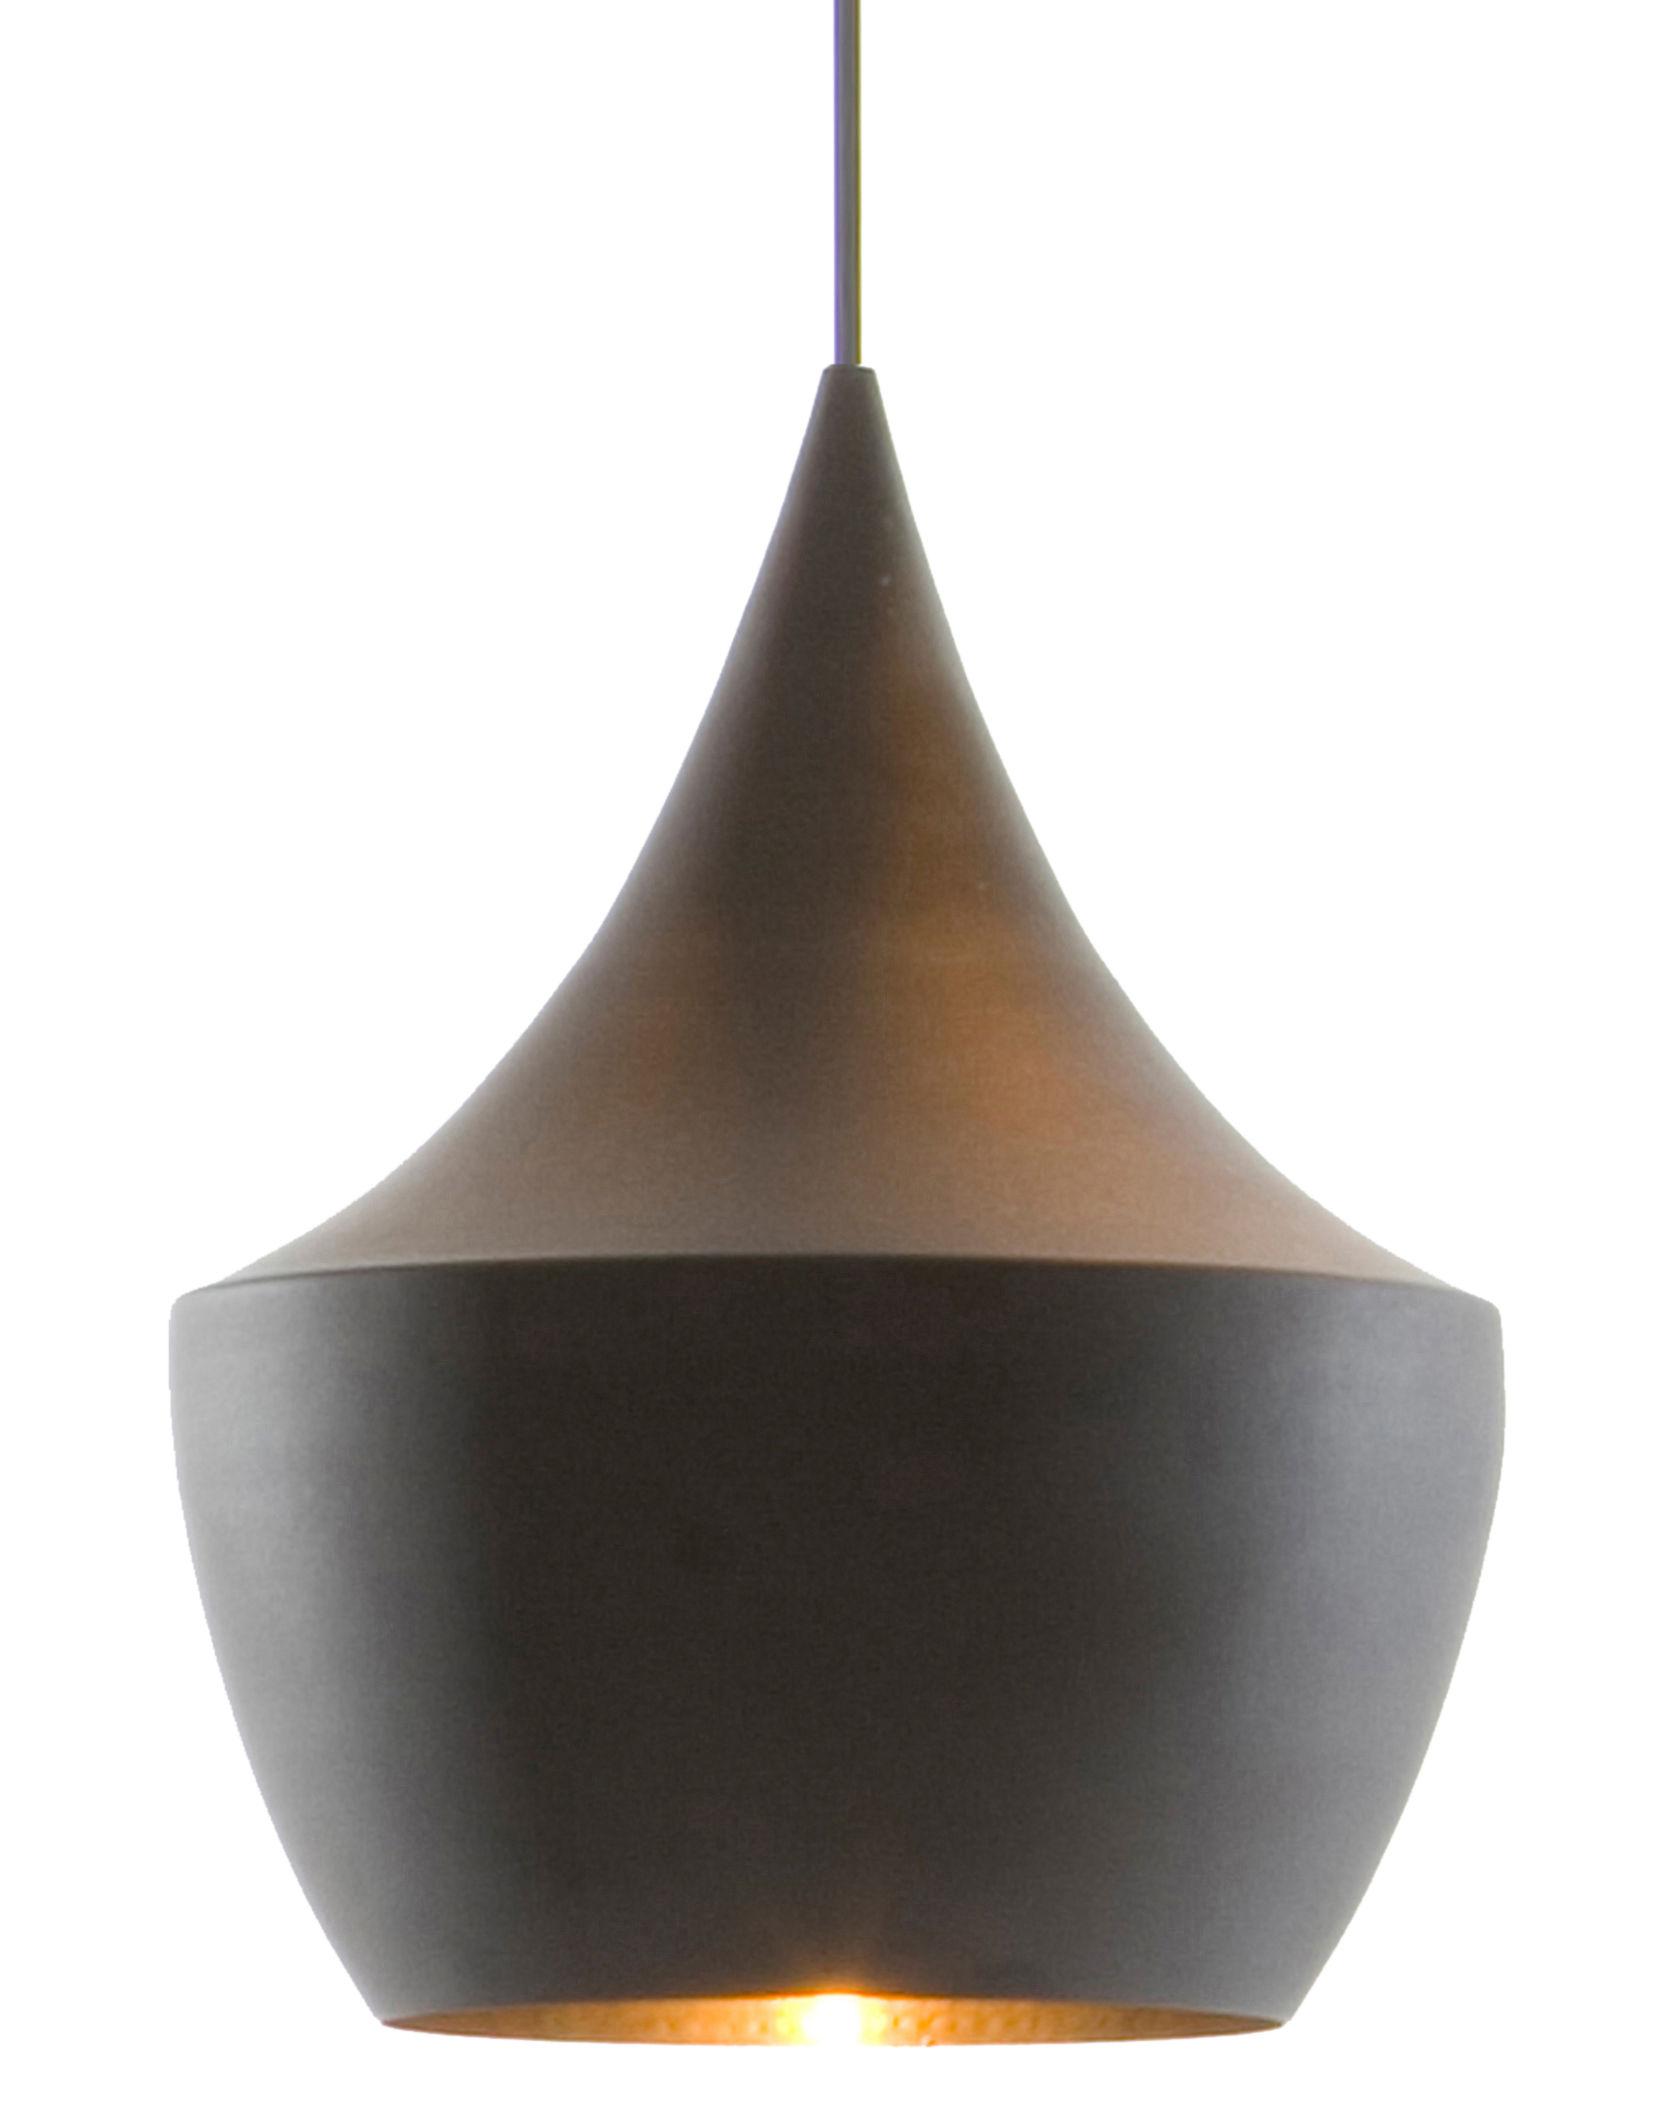 Lighting - Pendant Lighting - Beat Fat Pendant by Tom Dixon - Black / gold - Brass